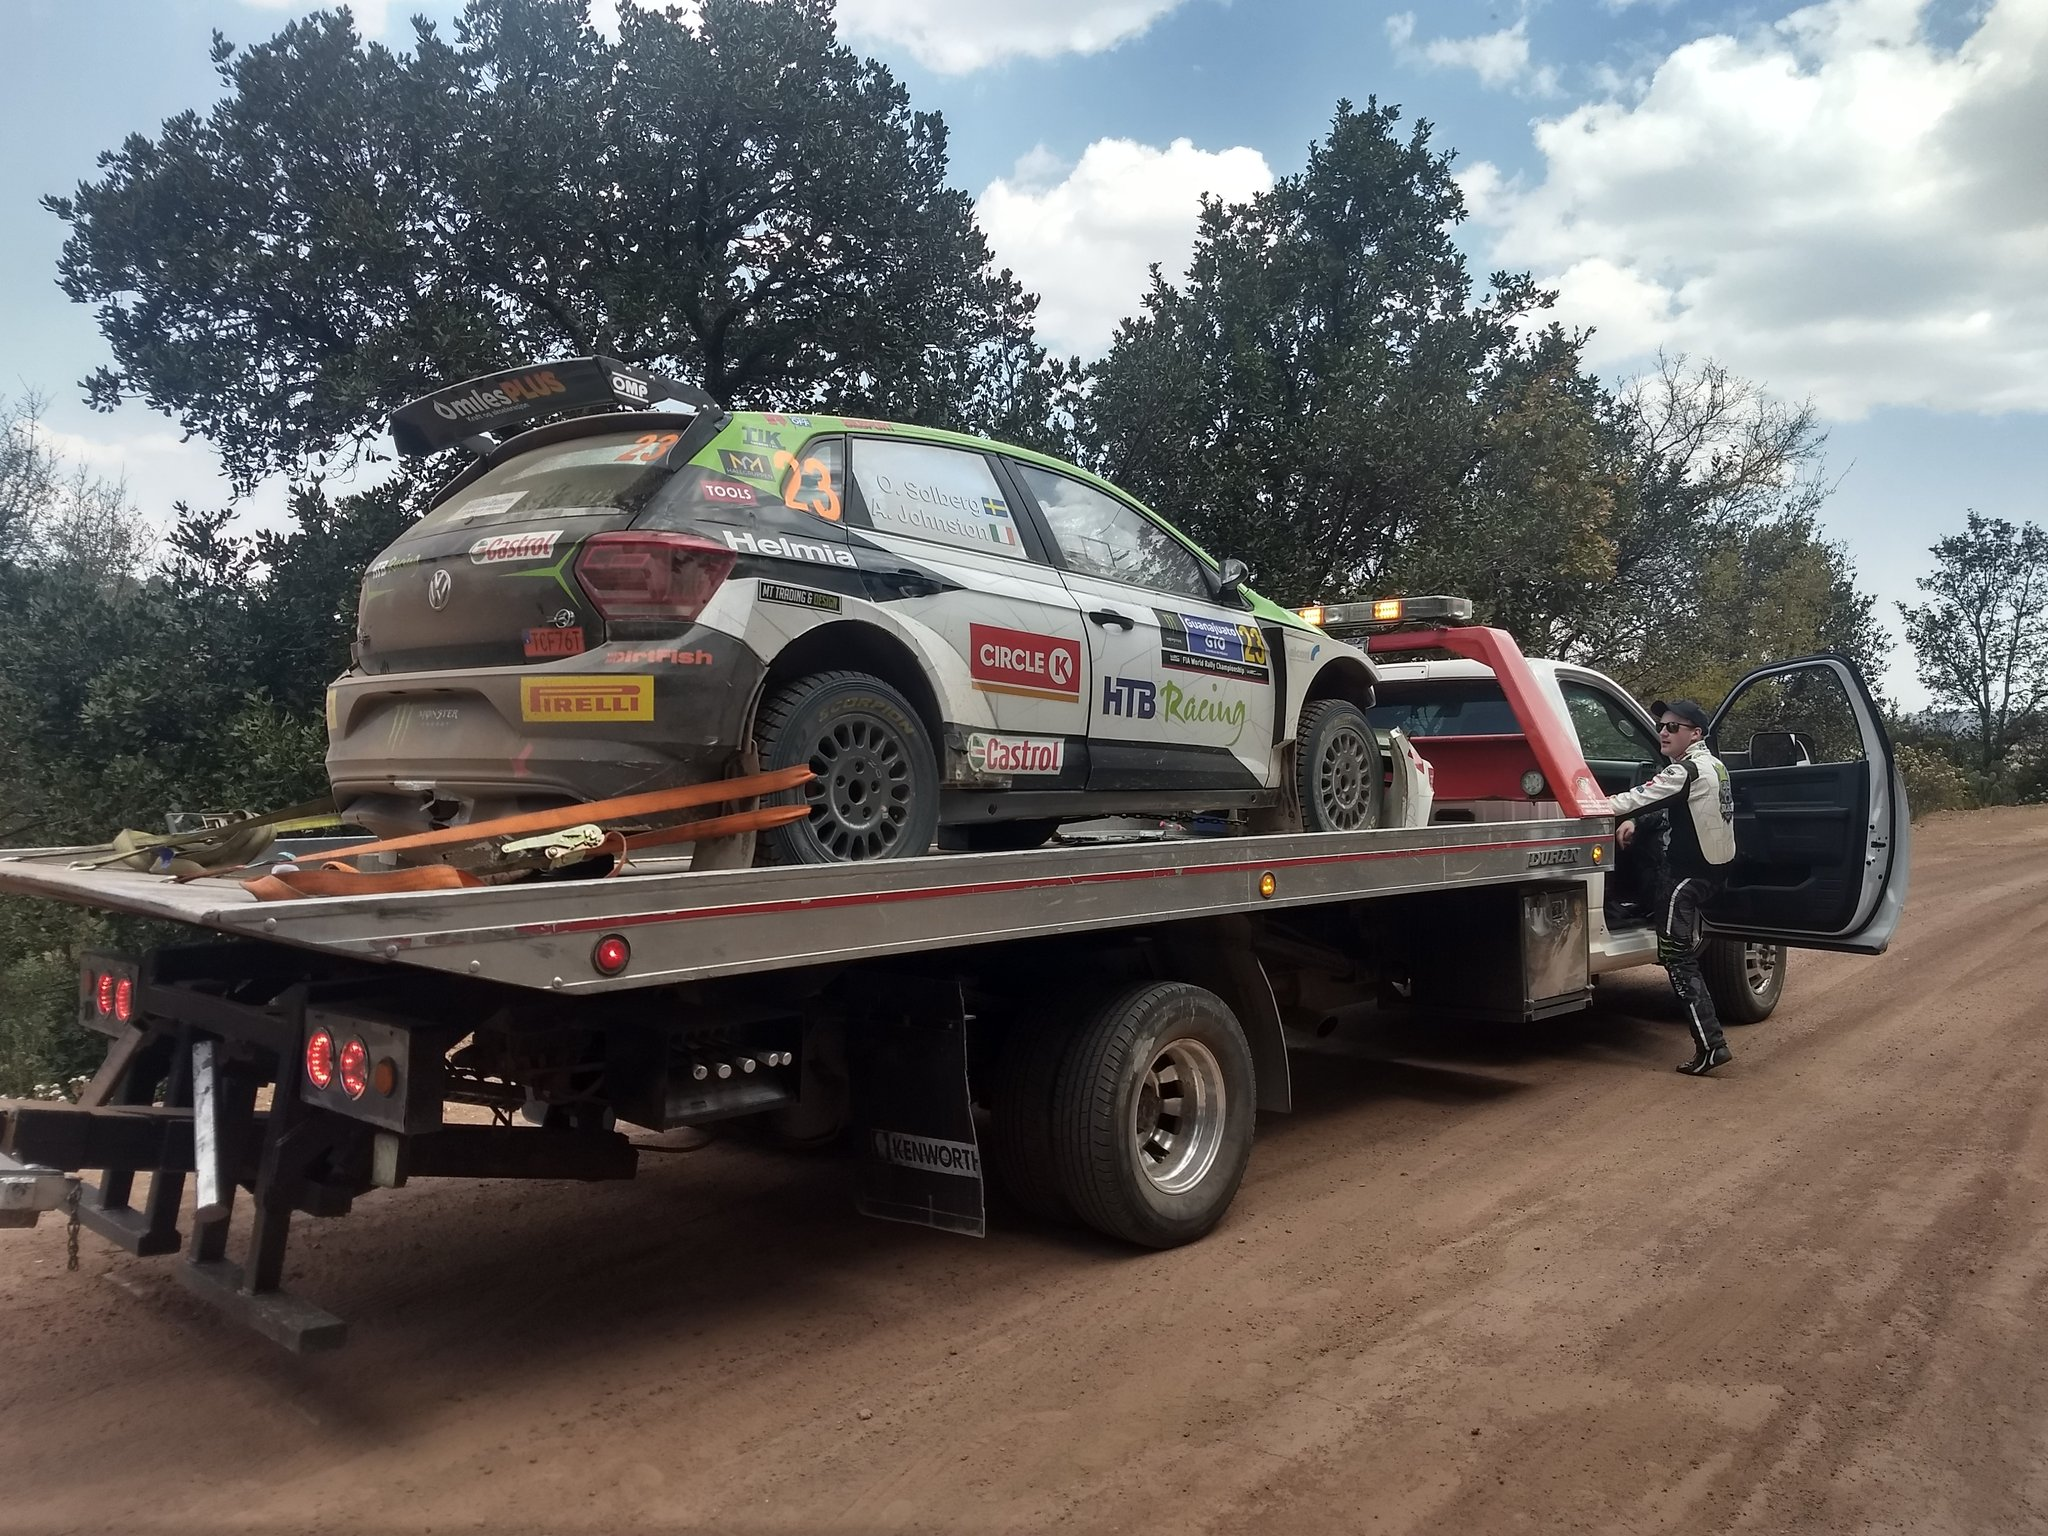 WRC: 17º Rallye Guanajuato Corona - México [12-15 Marzo] - Página 4 ETBJfBeXkAAGwht?format=jpg&name=large